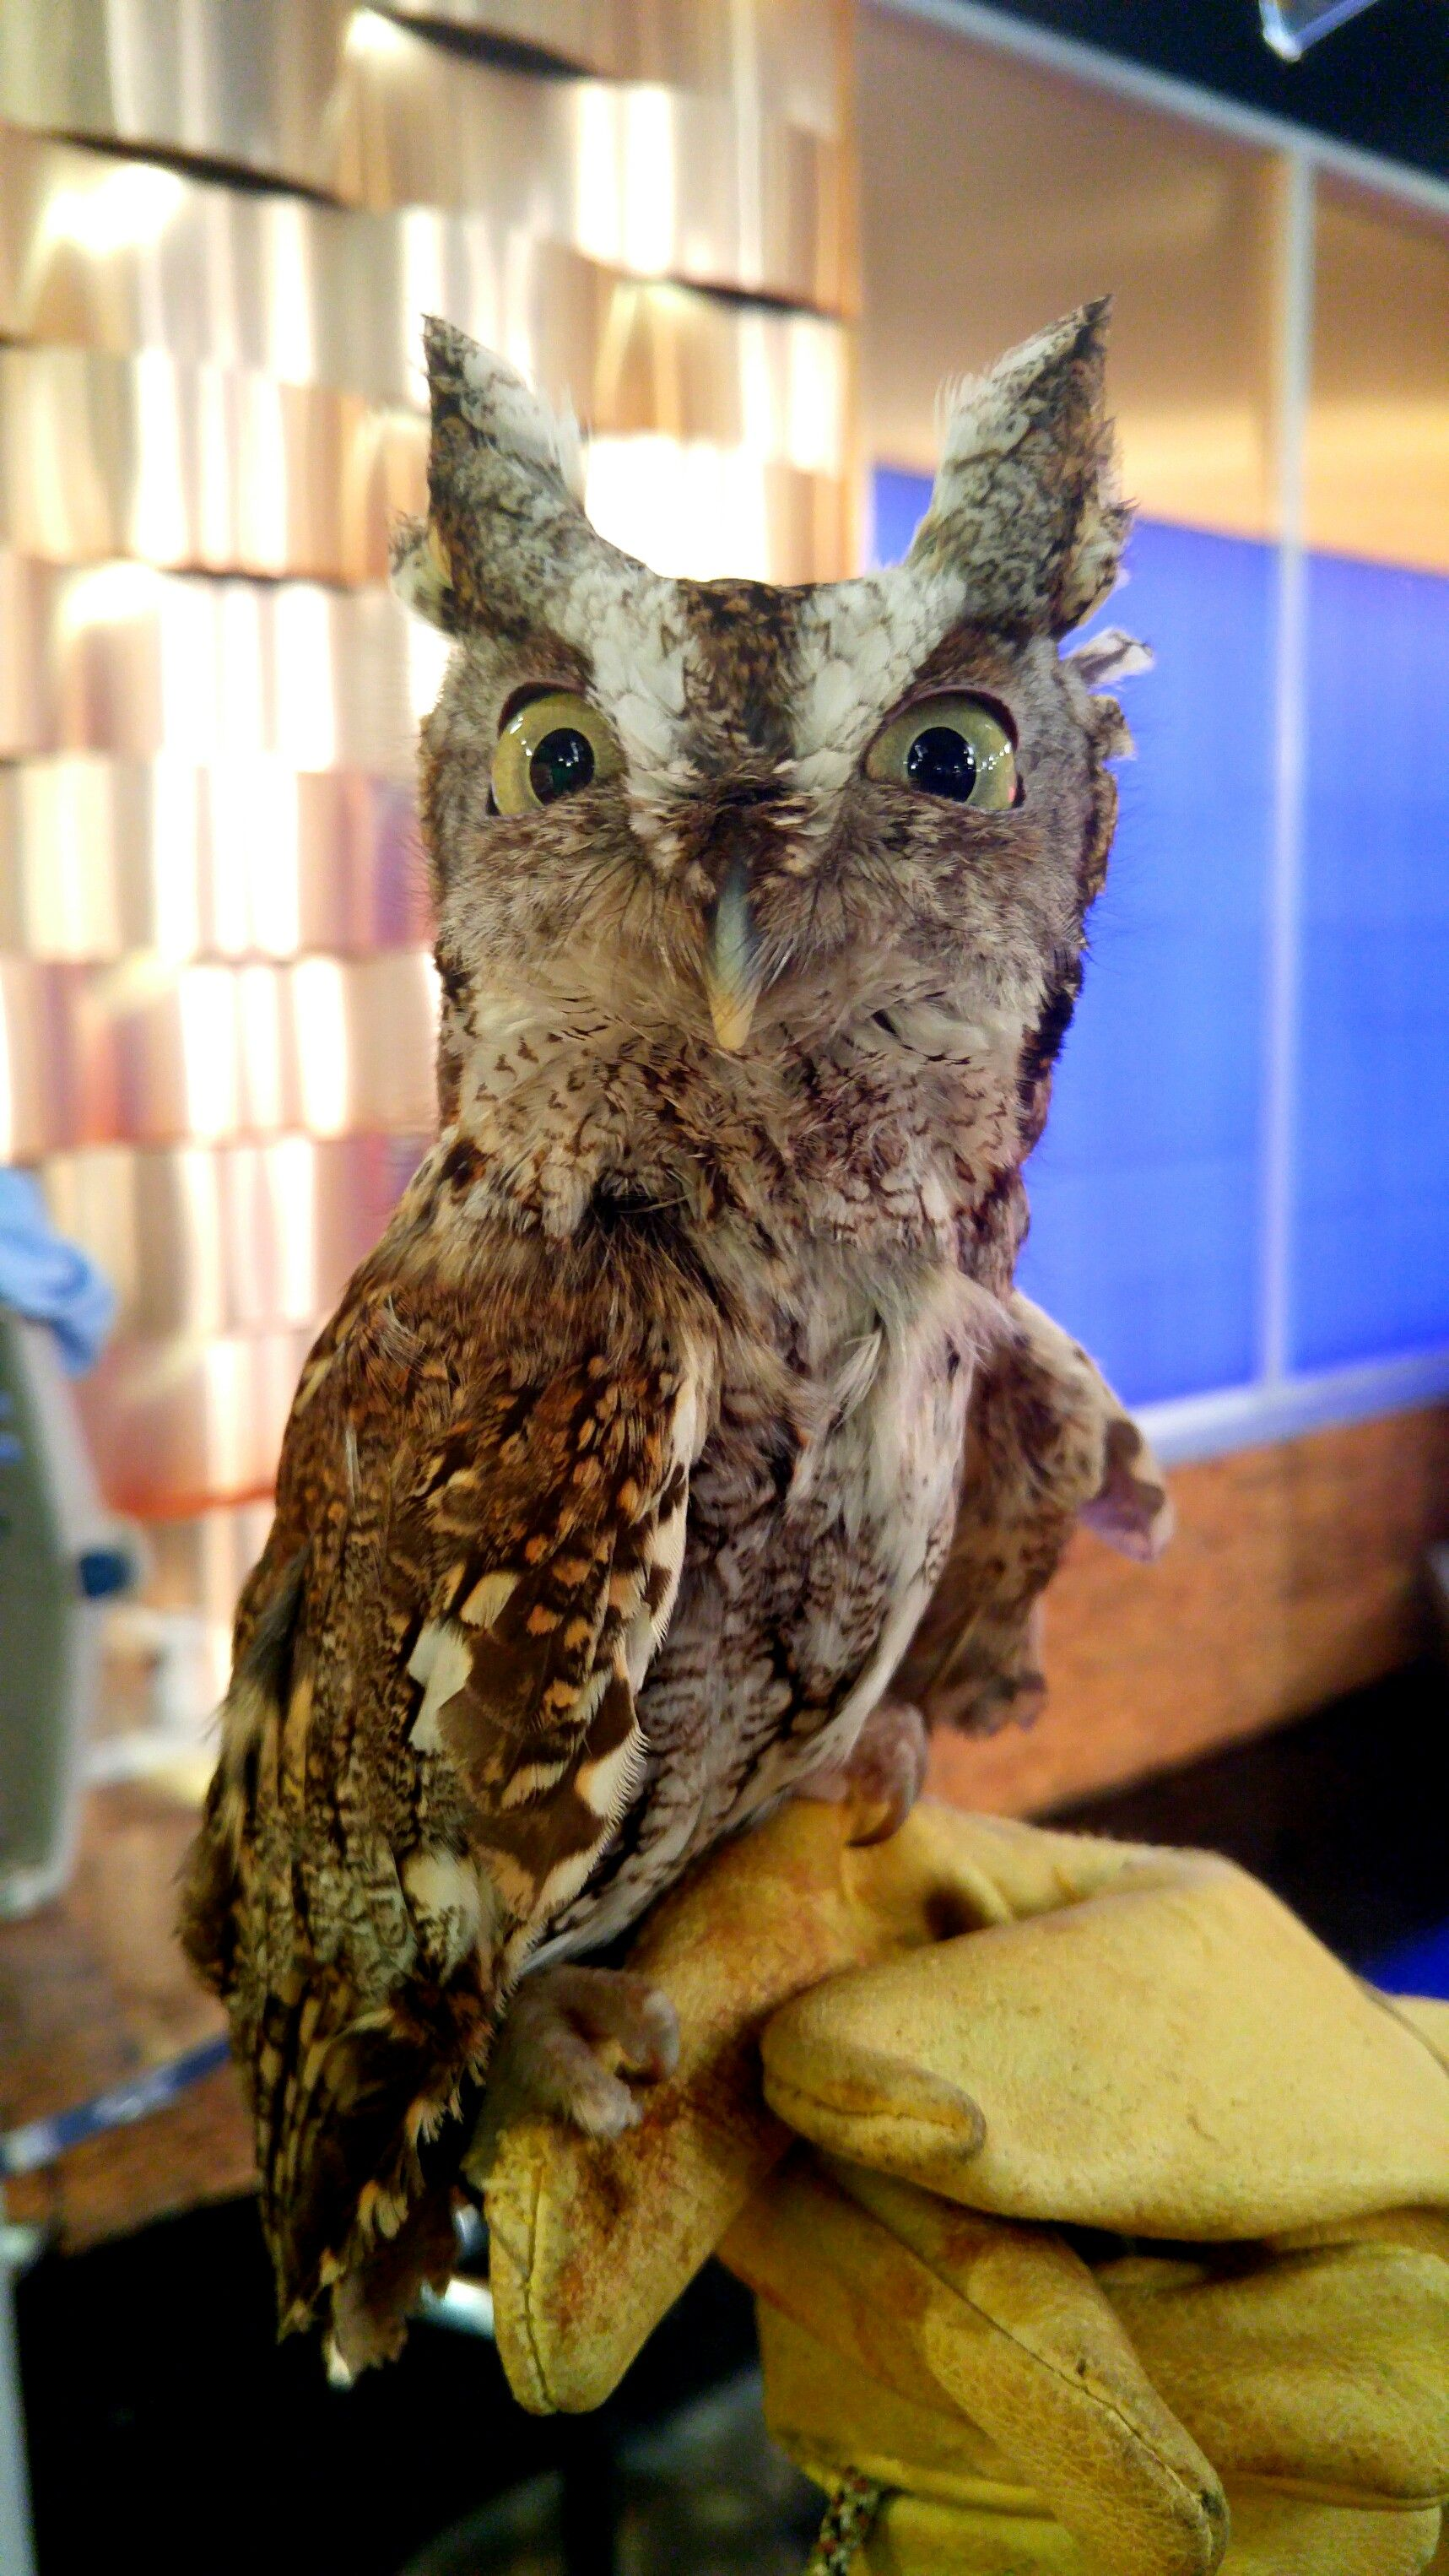 This Baby Screech Owl | Screech owl, Owl